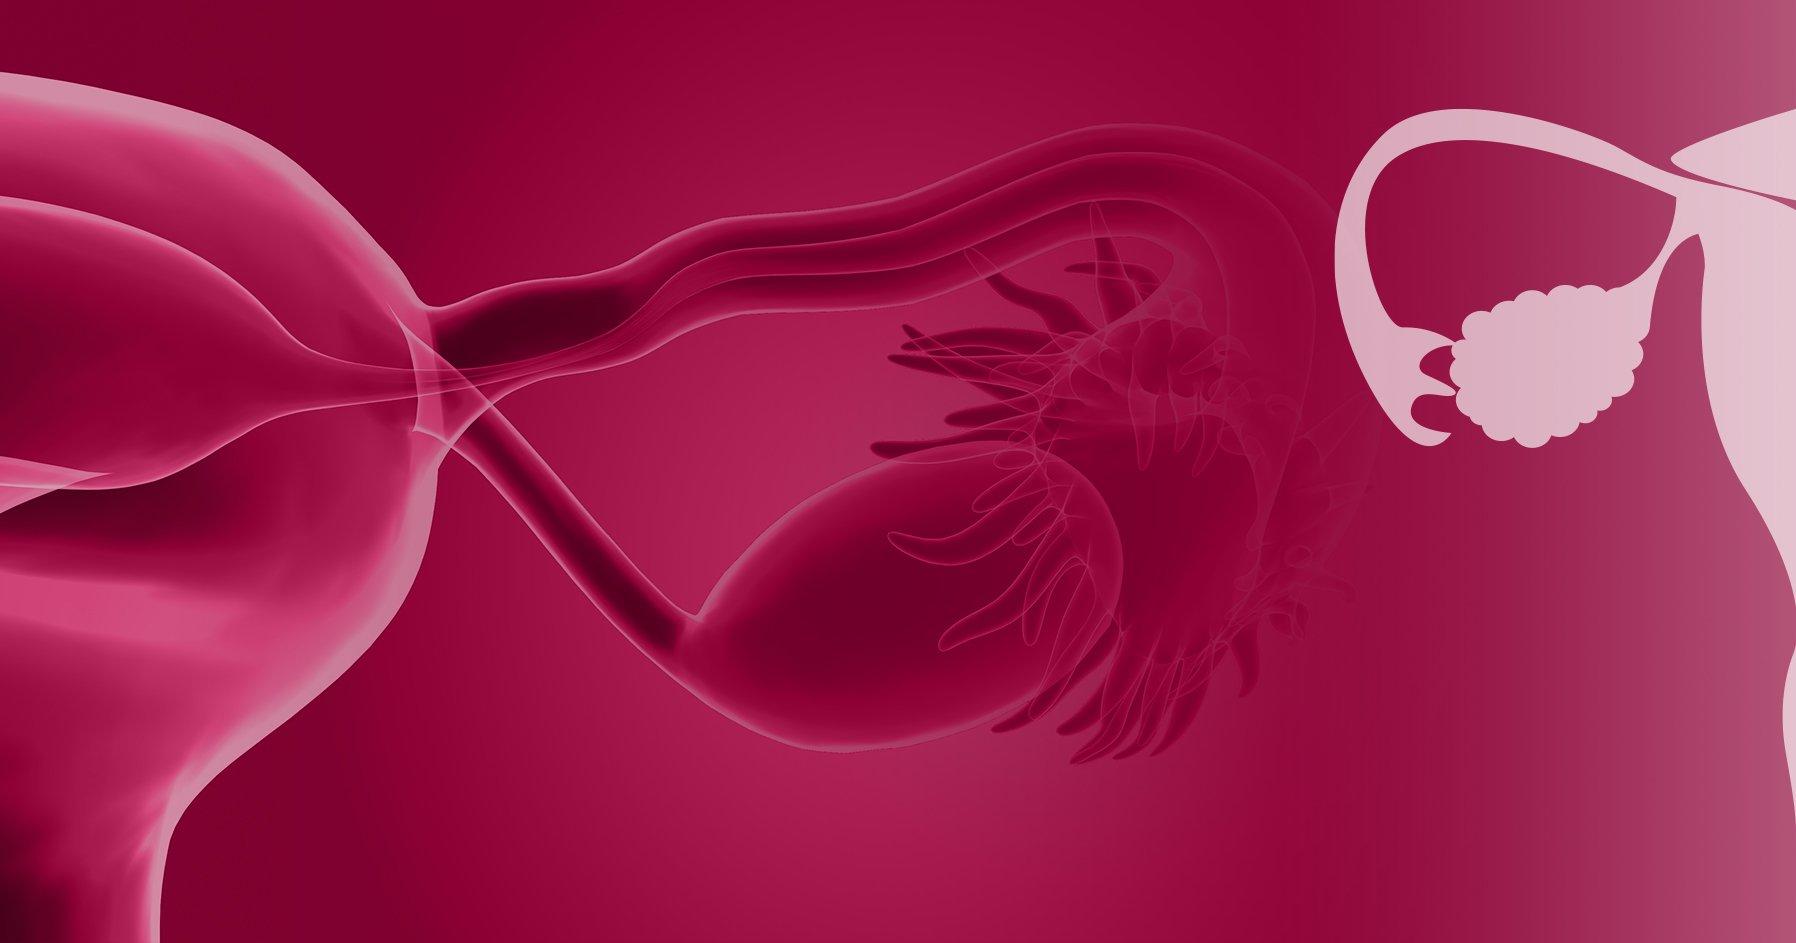 Aflați cum am vindecat metabolism glucidic crescut la nivel cerebral meu